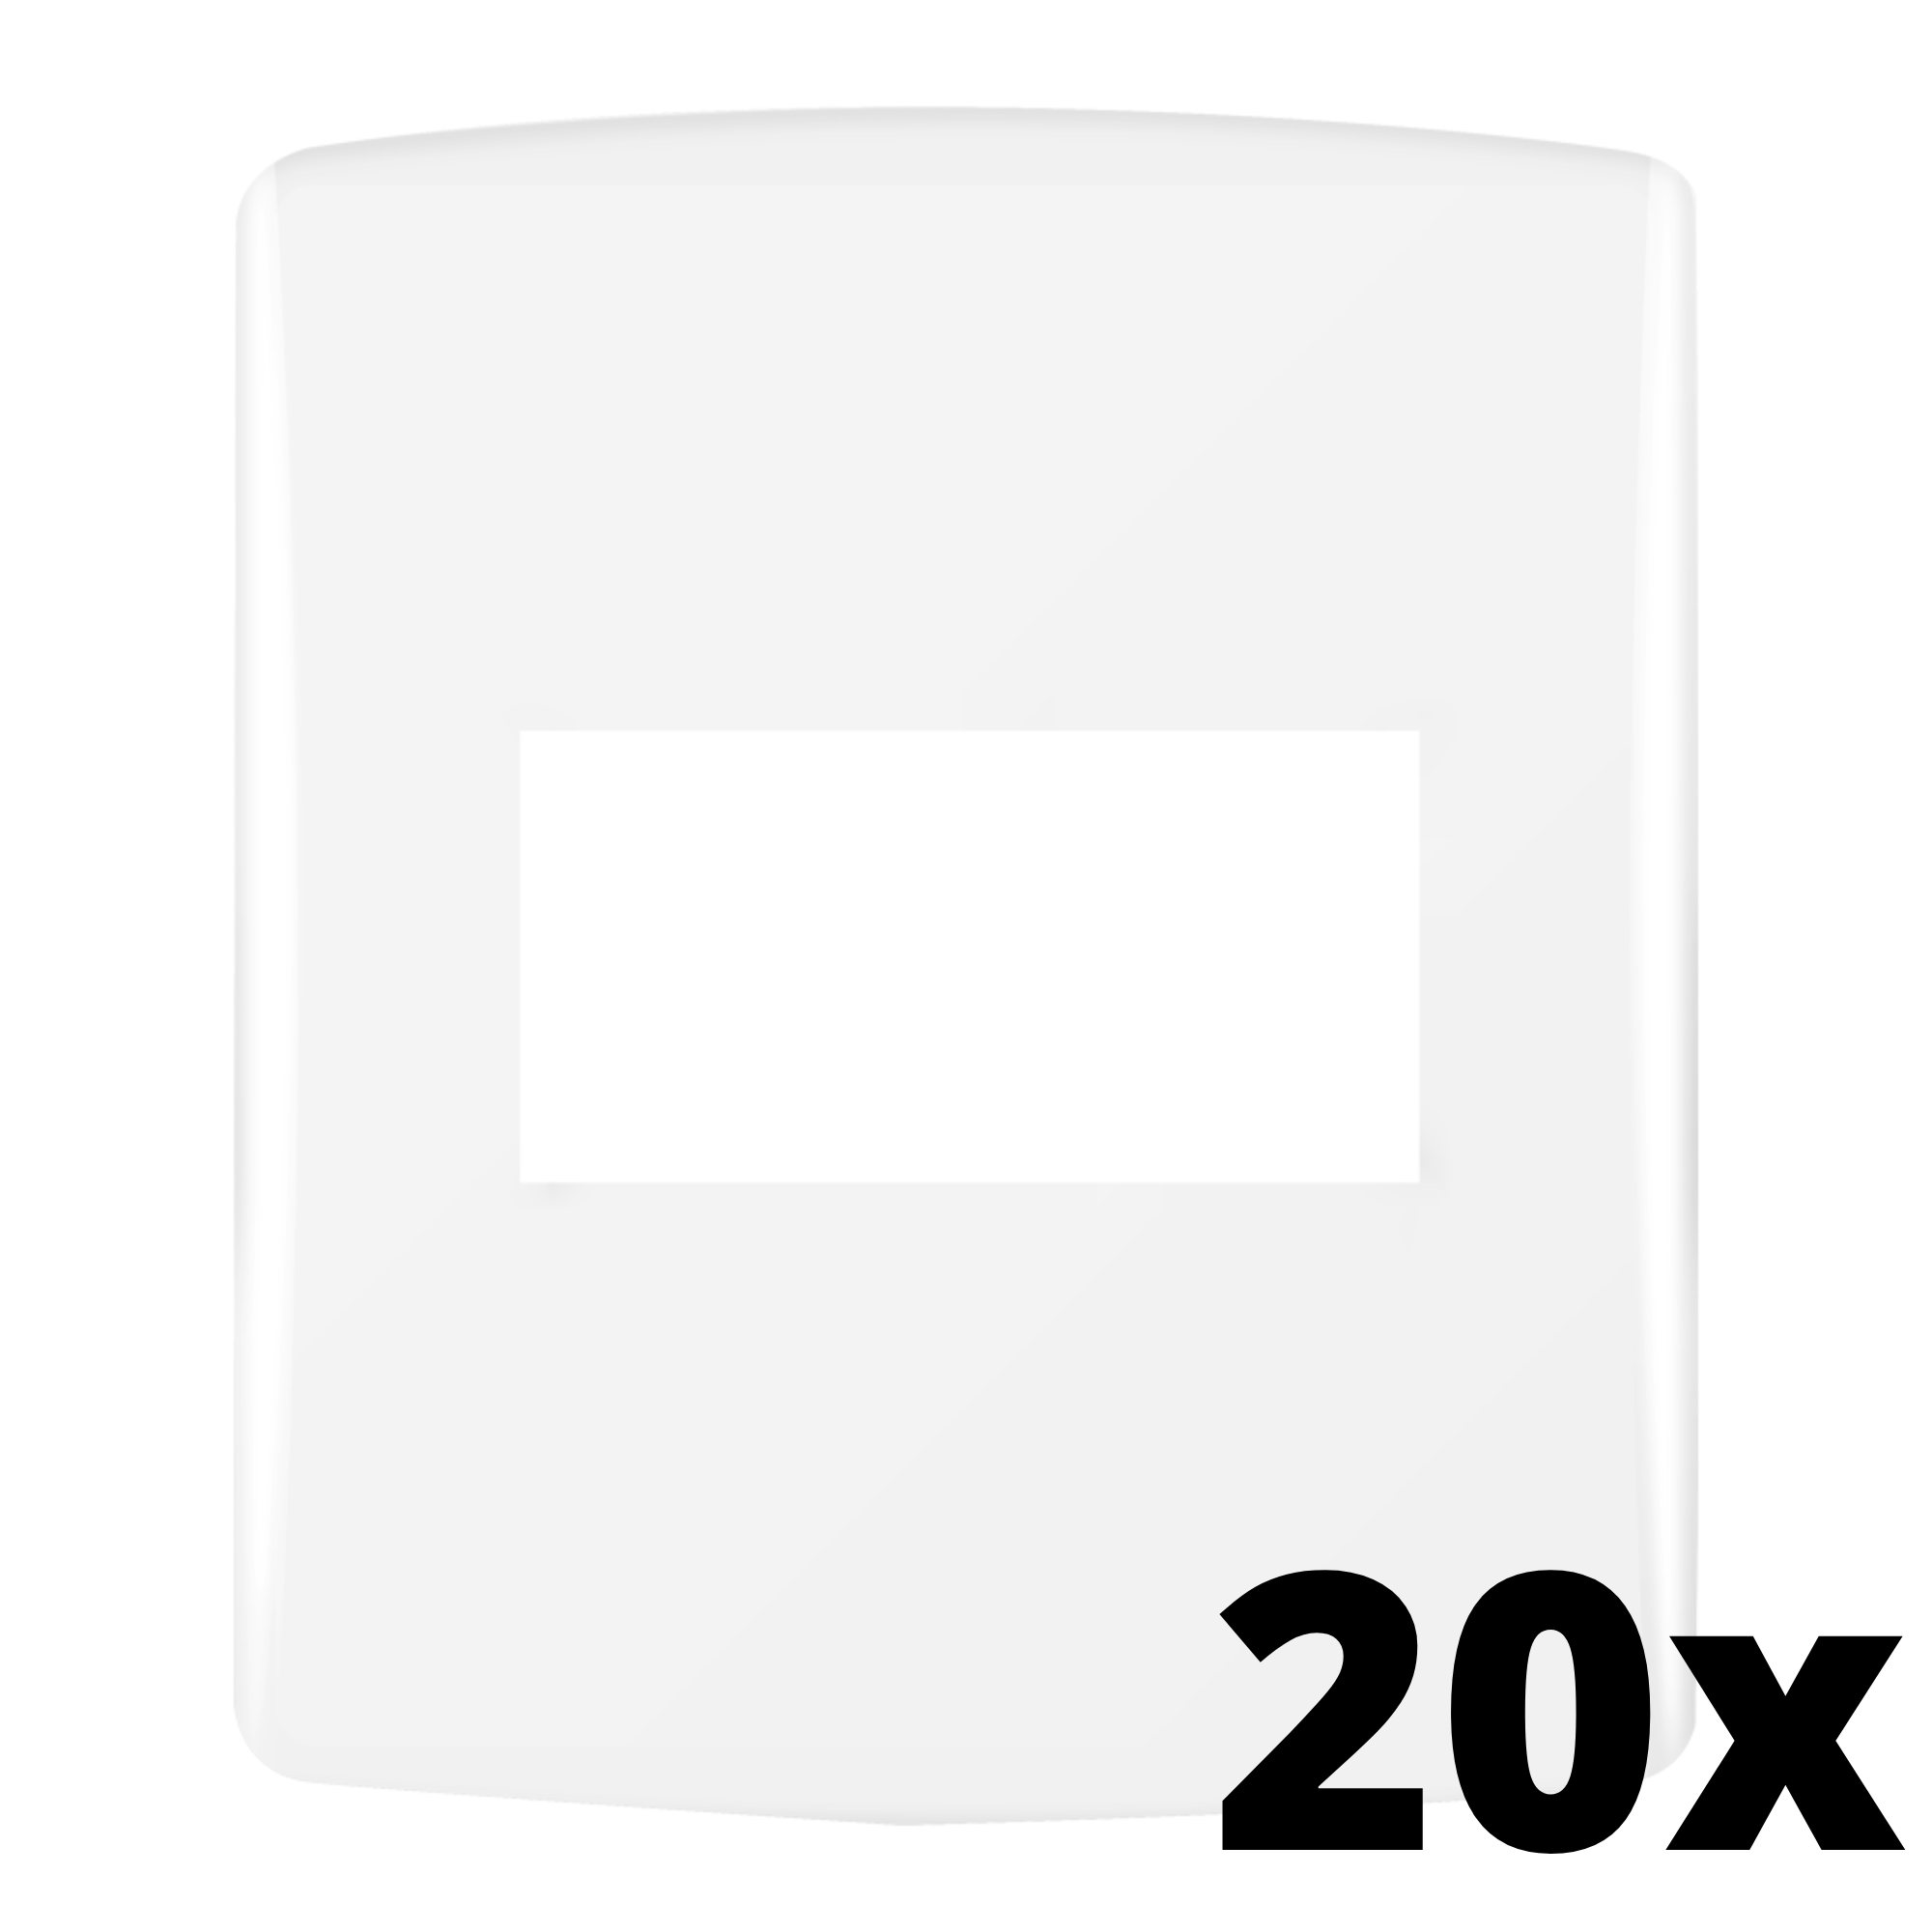 Kit 20 und Siena Fácil Placa 4x2 1 Seção